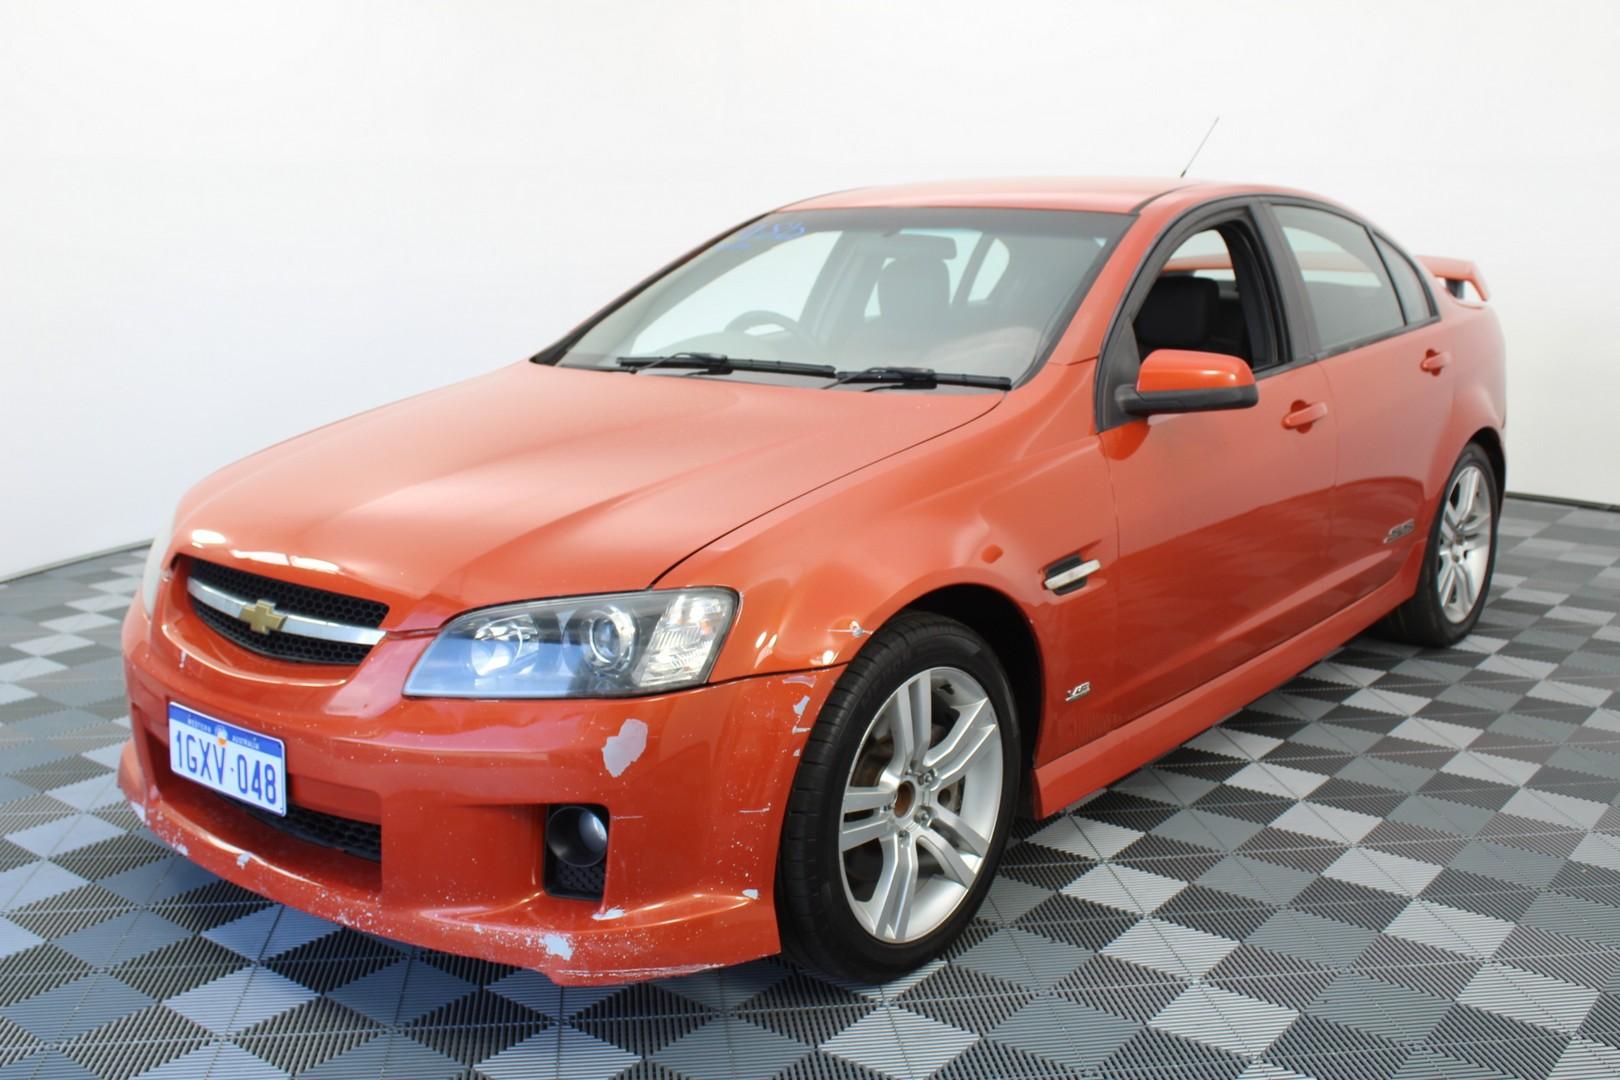 2007 Holden Commodore SS VE Manual Sedan